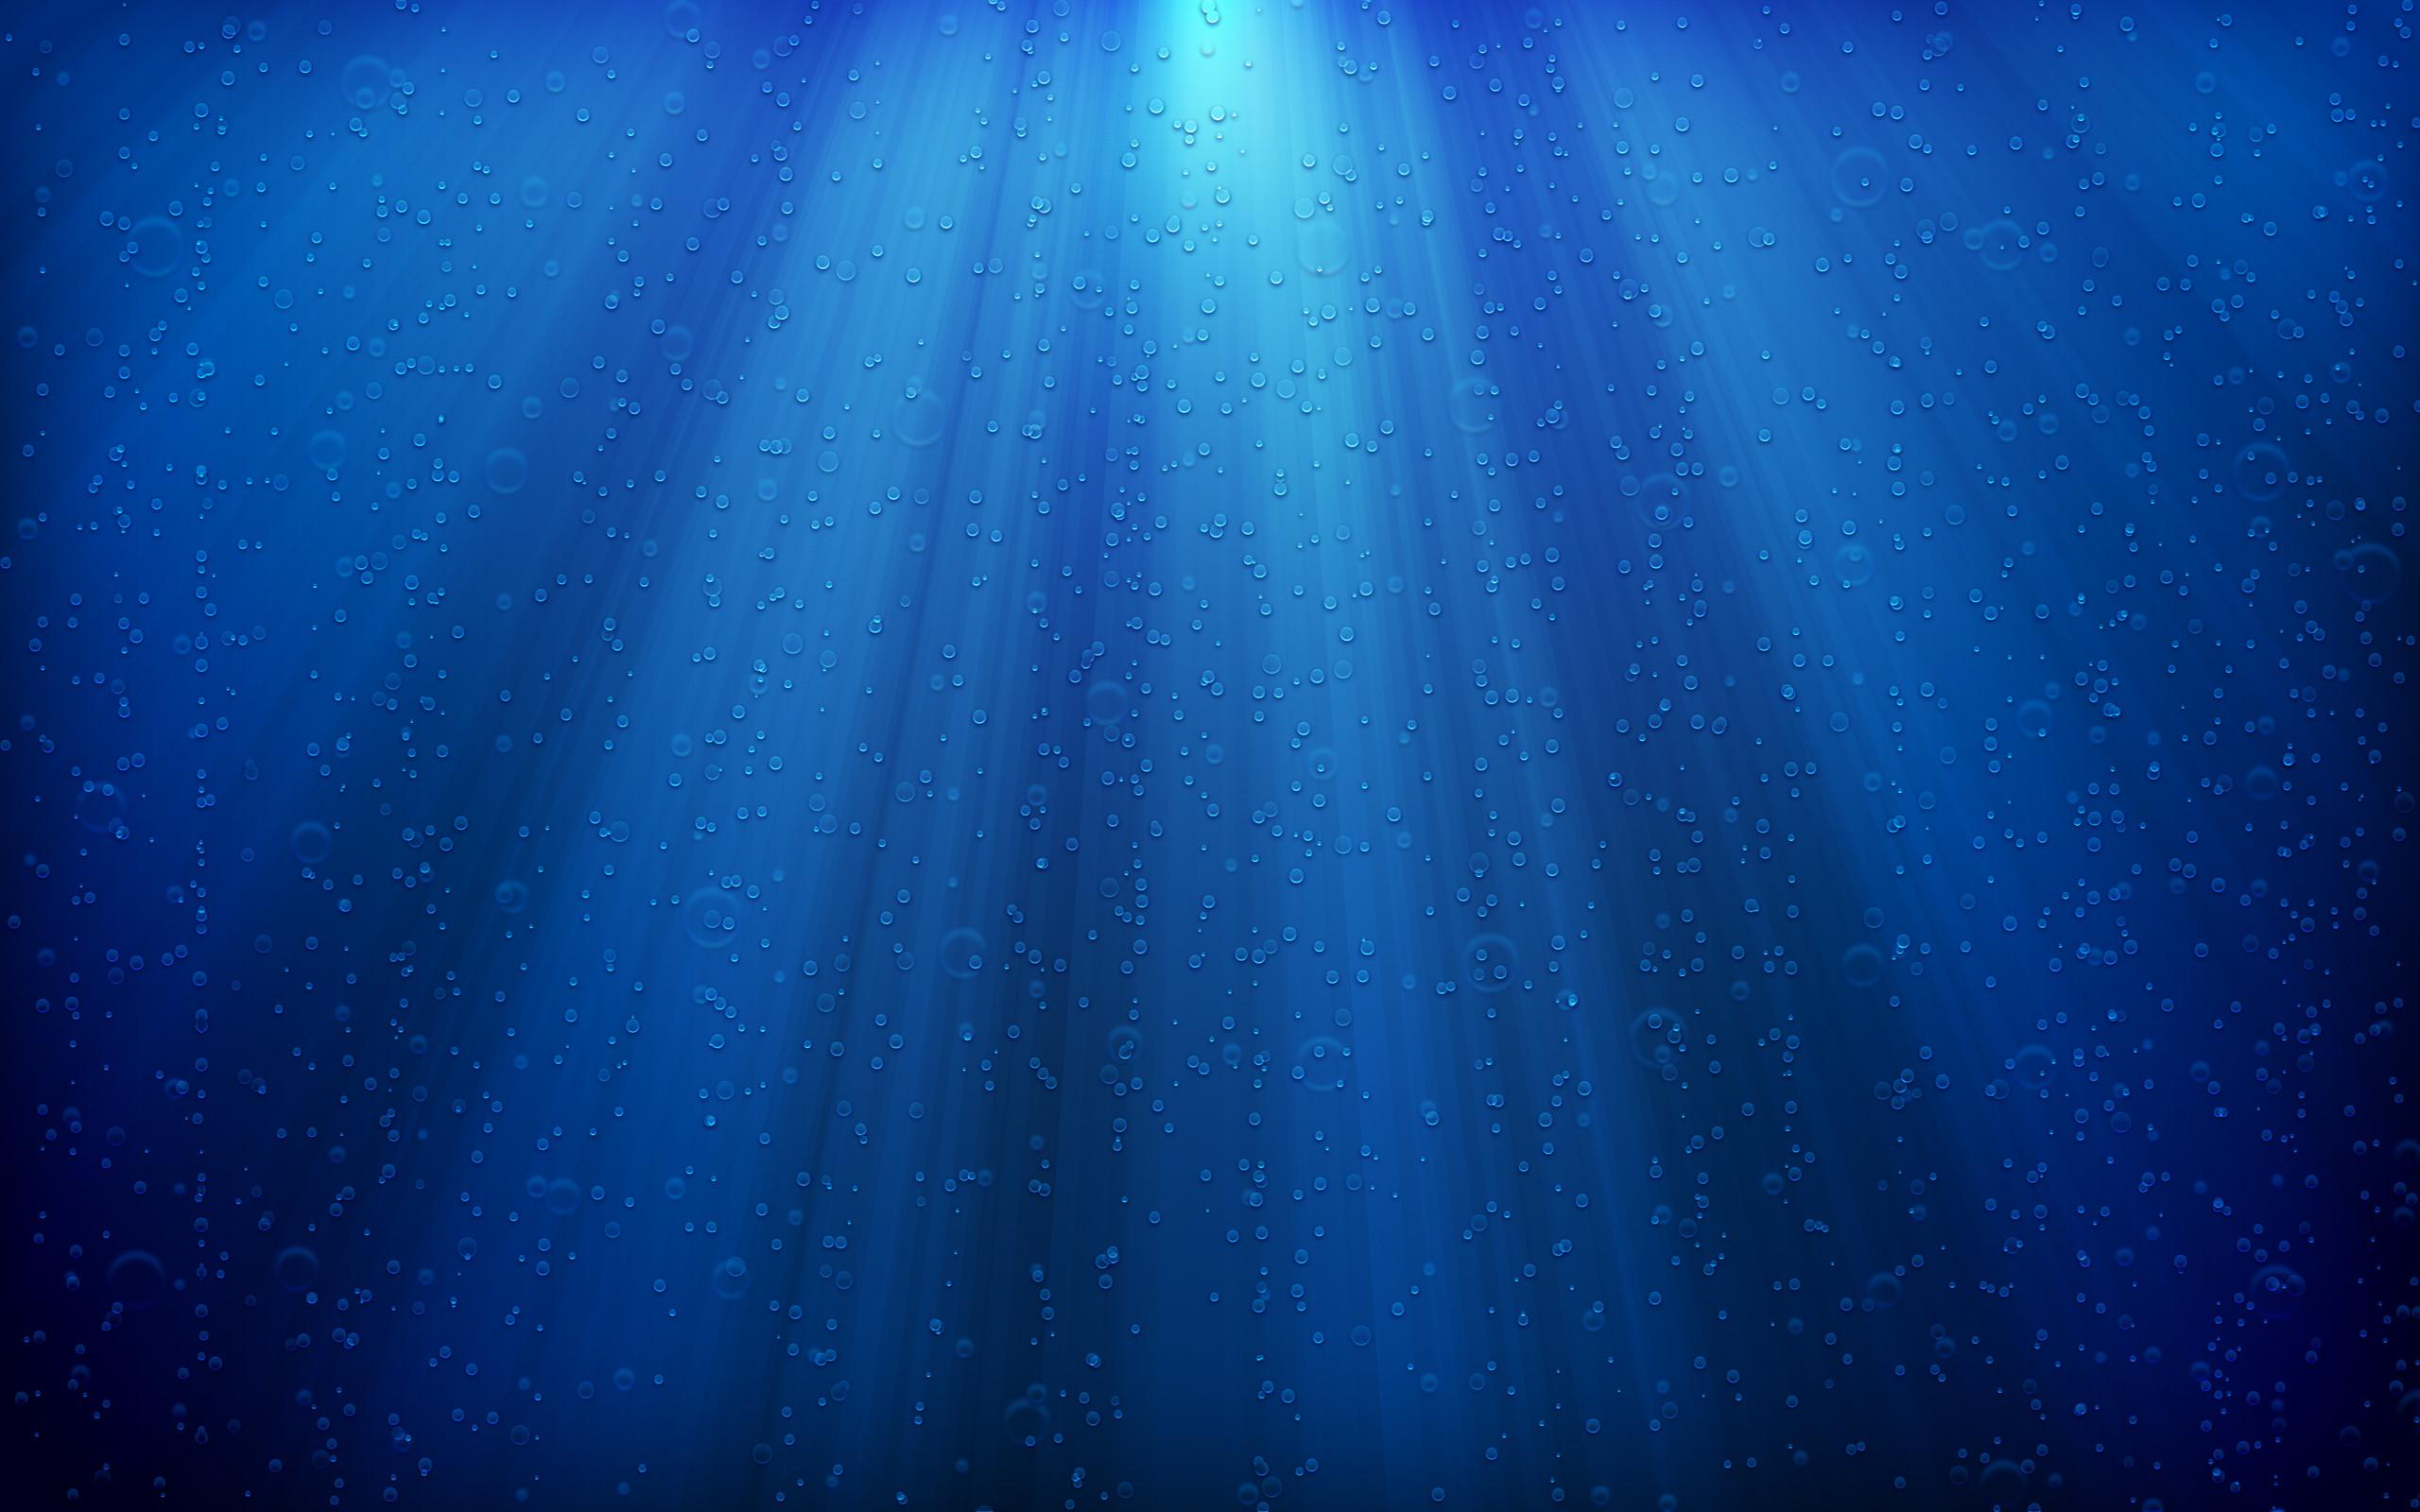 Underwater Wallpapers | HD Wallpapers